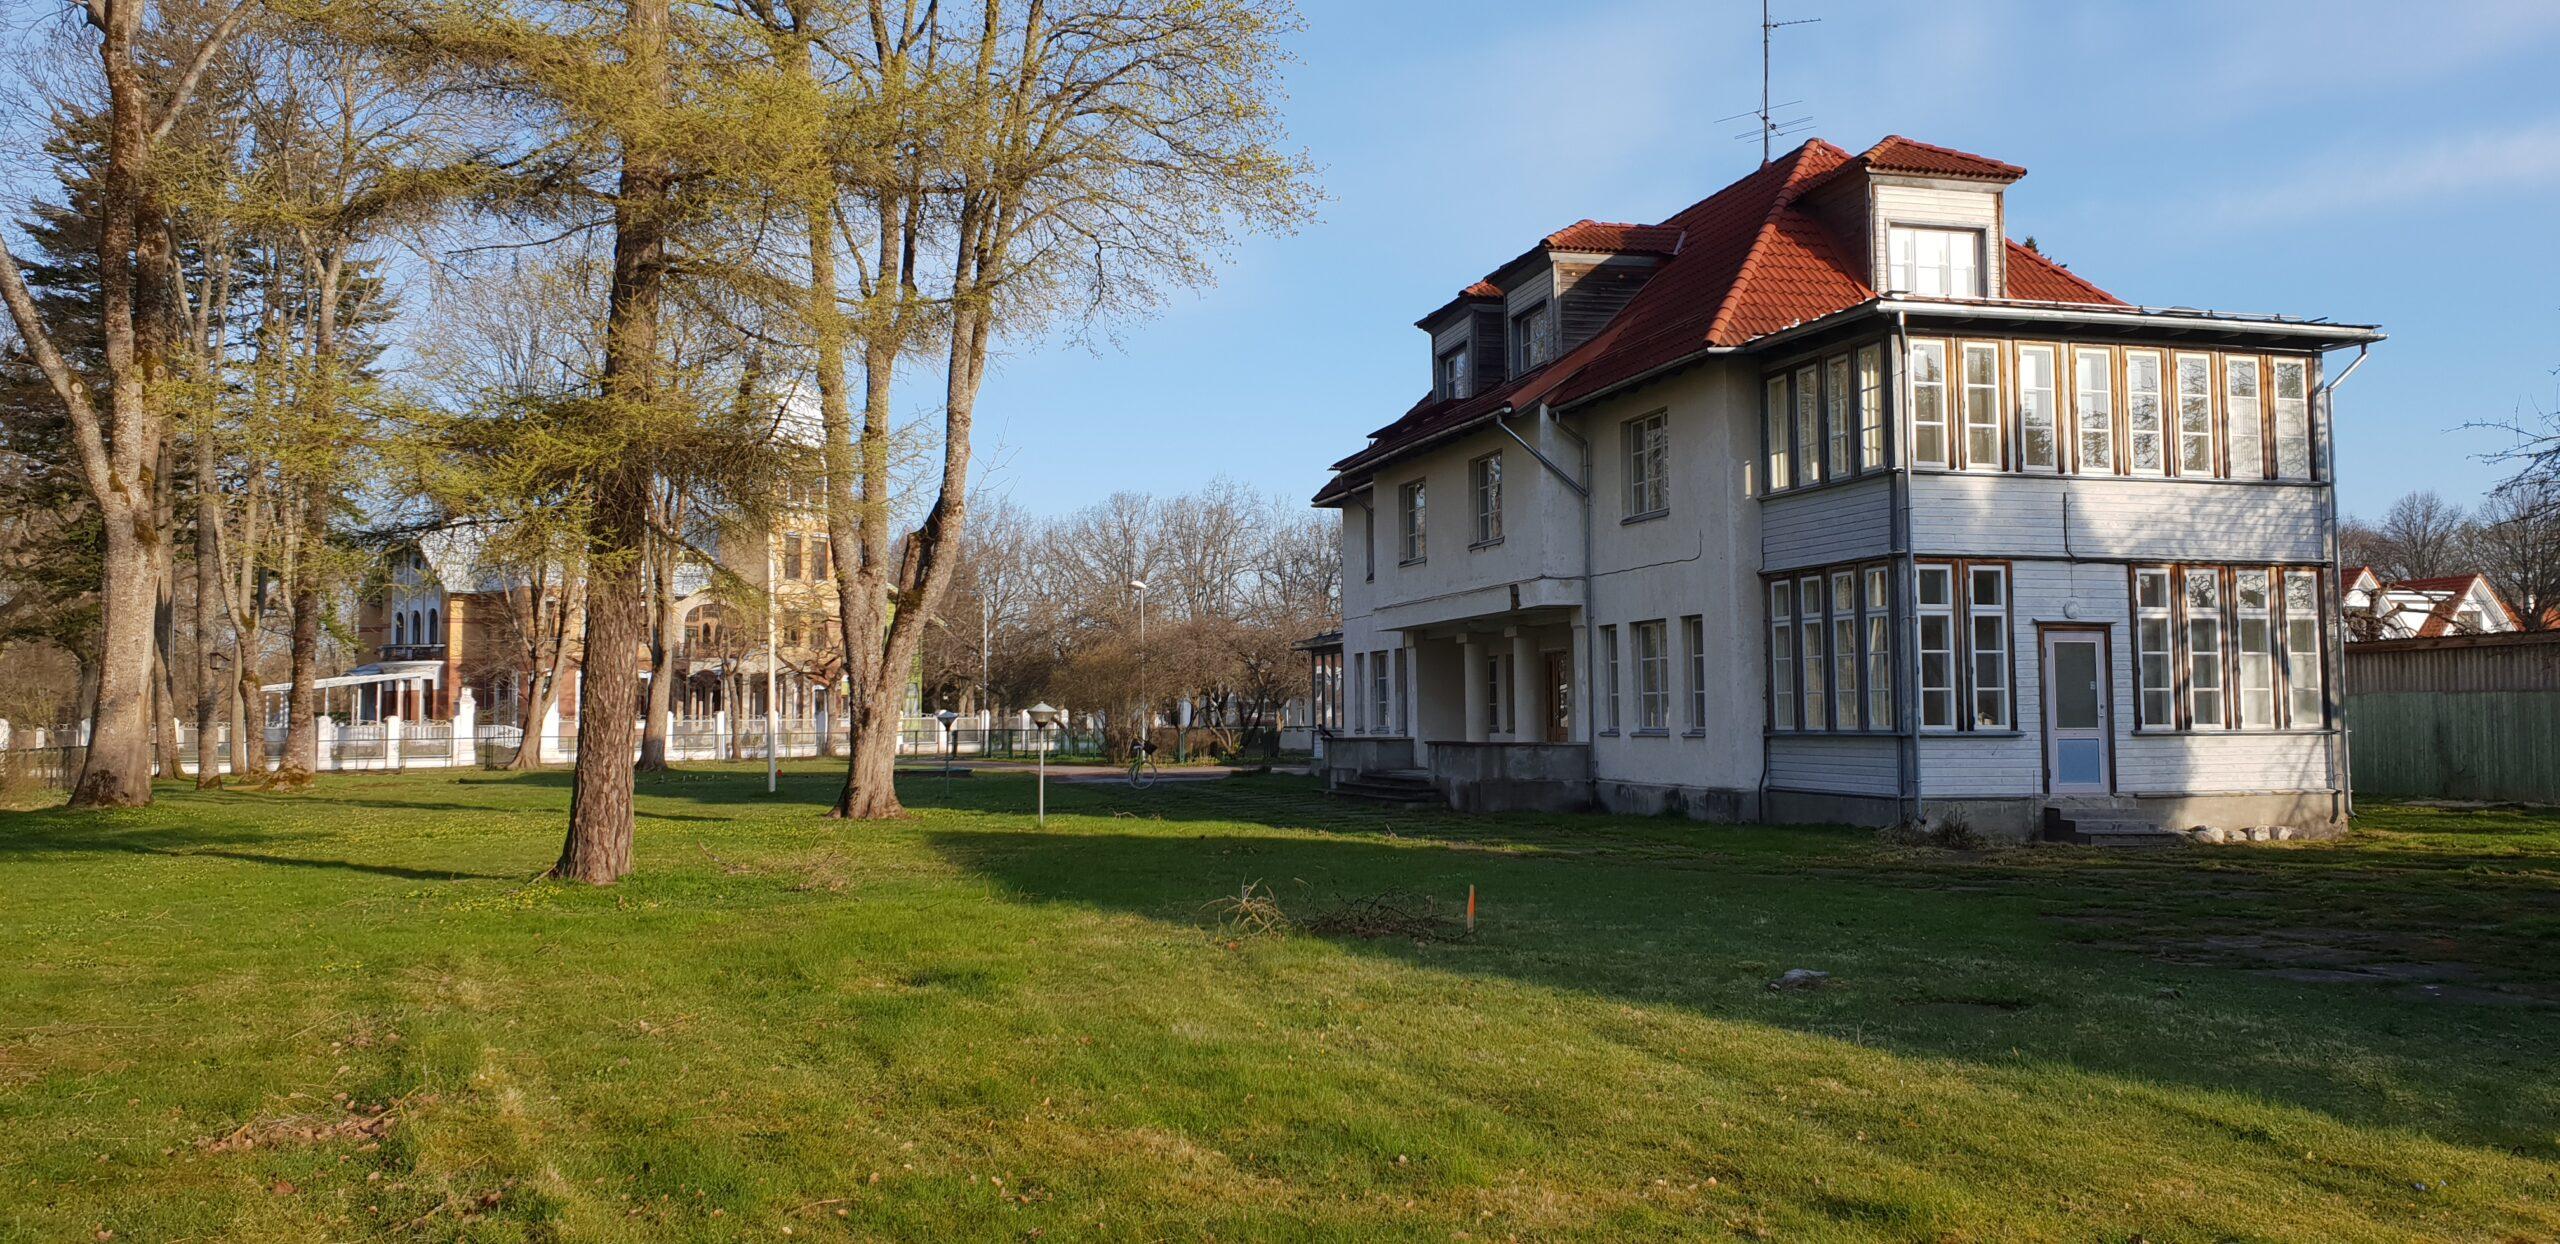 Spring in Parnu_ Errit Kuldkepp_Positively Inspiring Lifestyle_2020 (237)